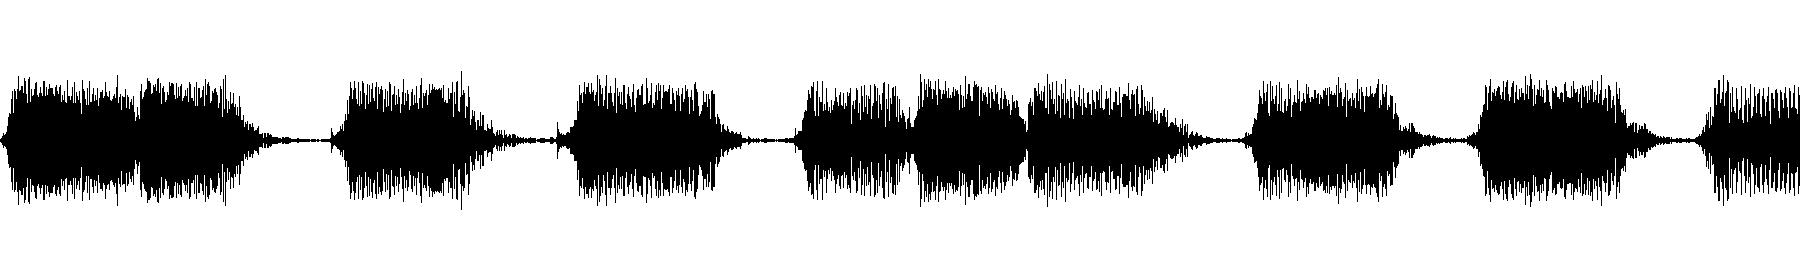 guitarrock01 130